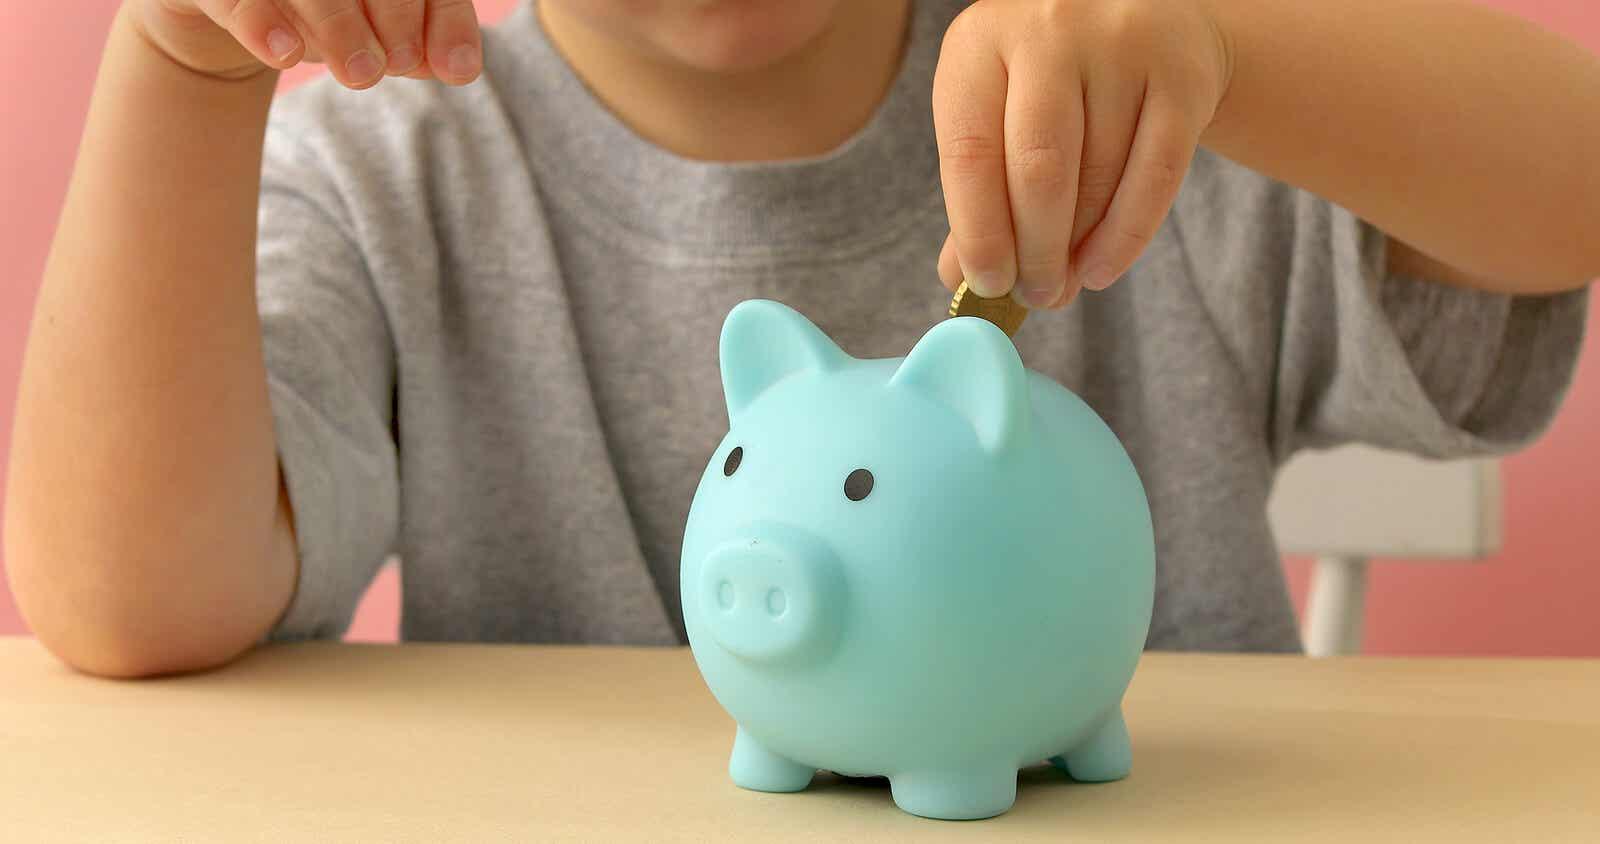 Child putting money into a piggy bank.